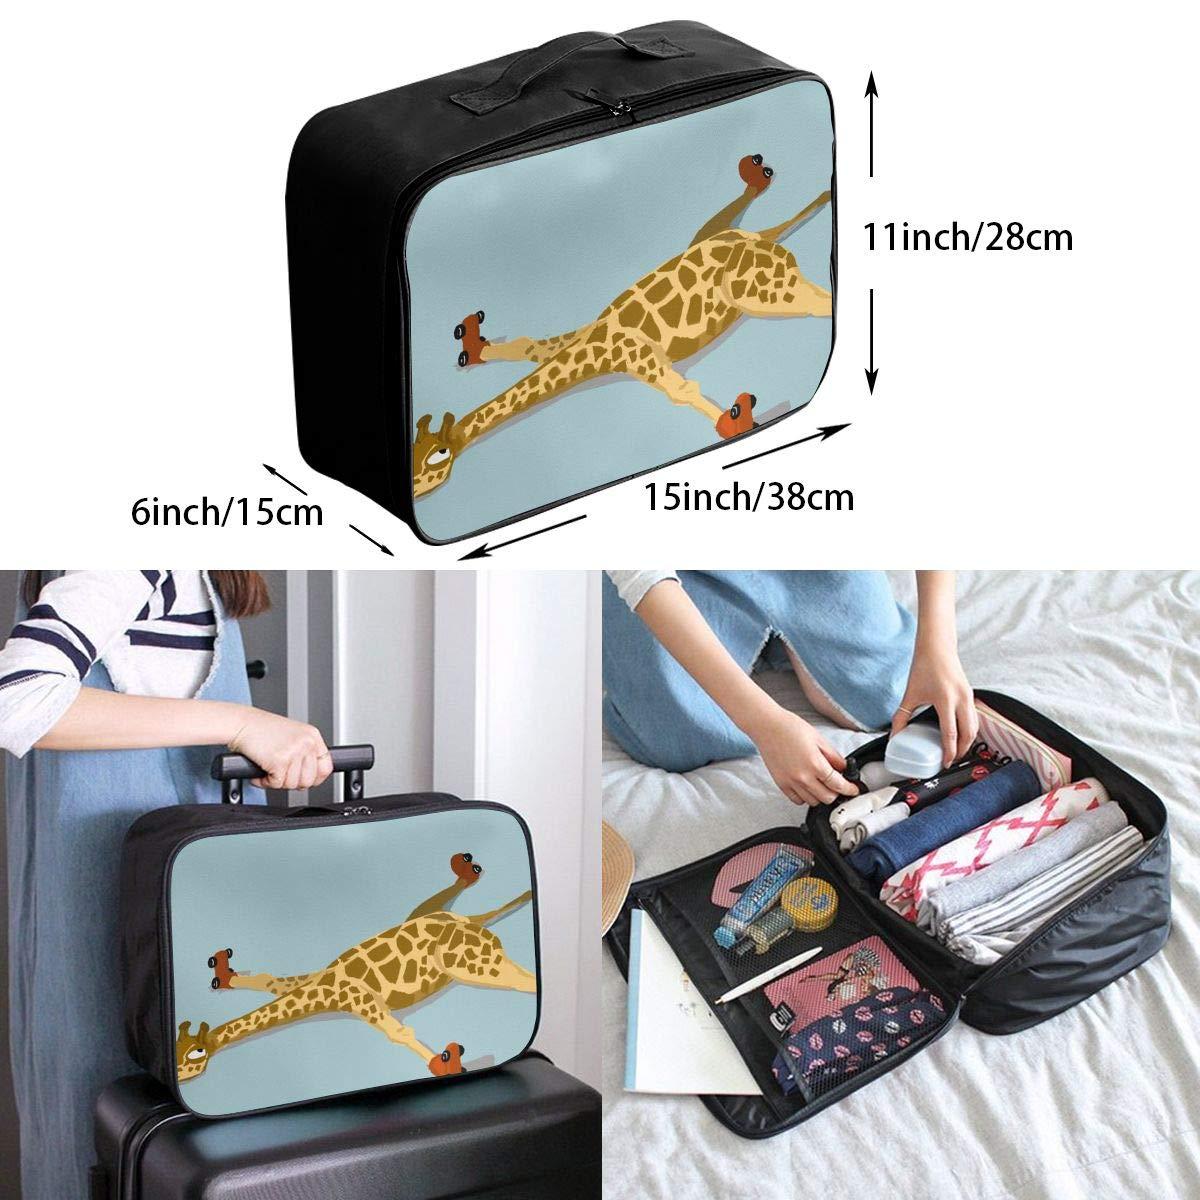 Travel Luggage Duffle Bag Lightweight Portable Handbag Roller Skating Large Capacity Waterproof Foldable Storage Tote